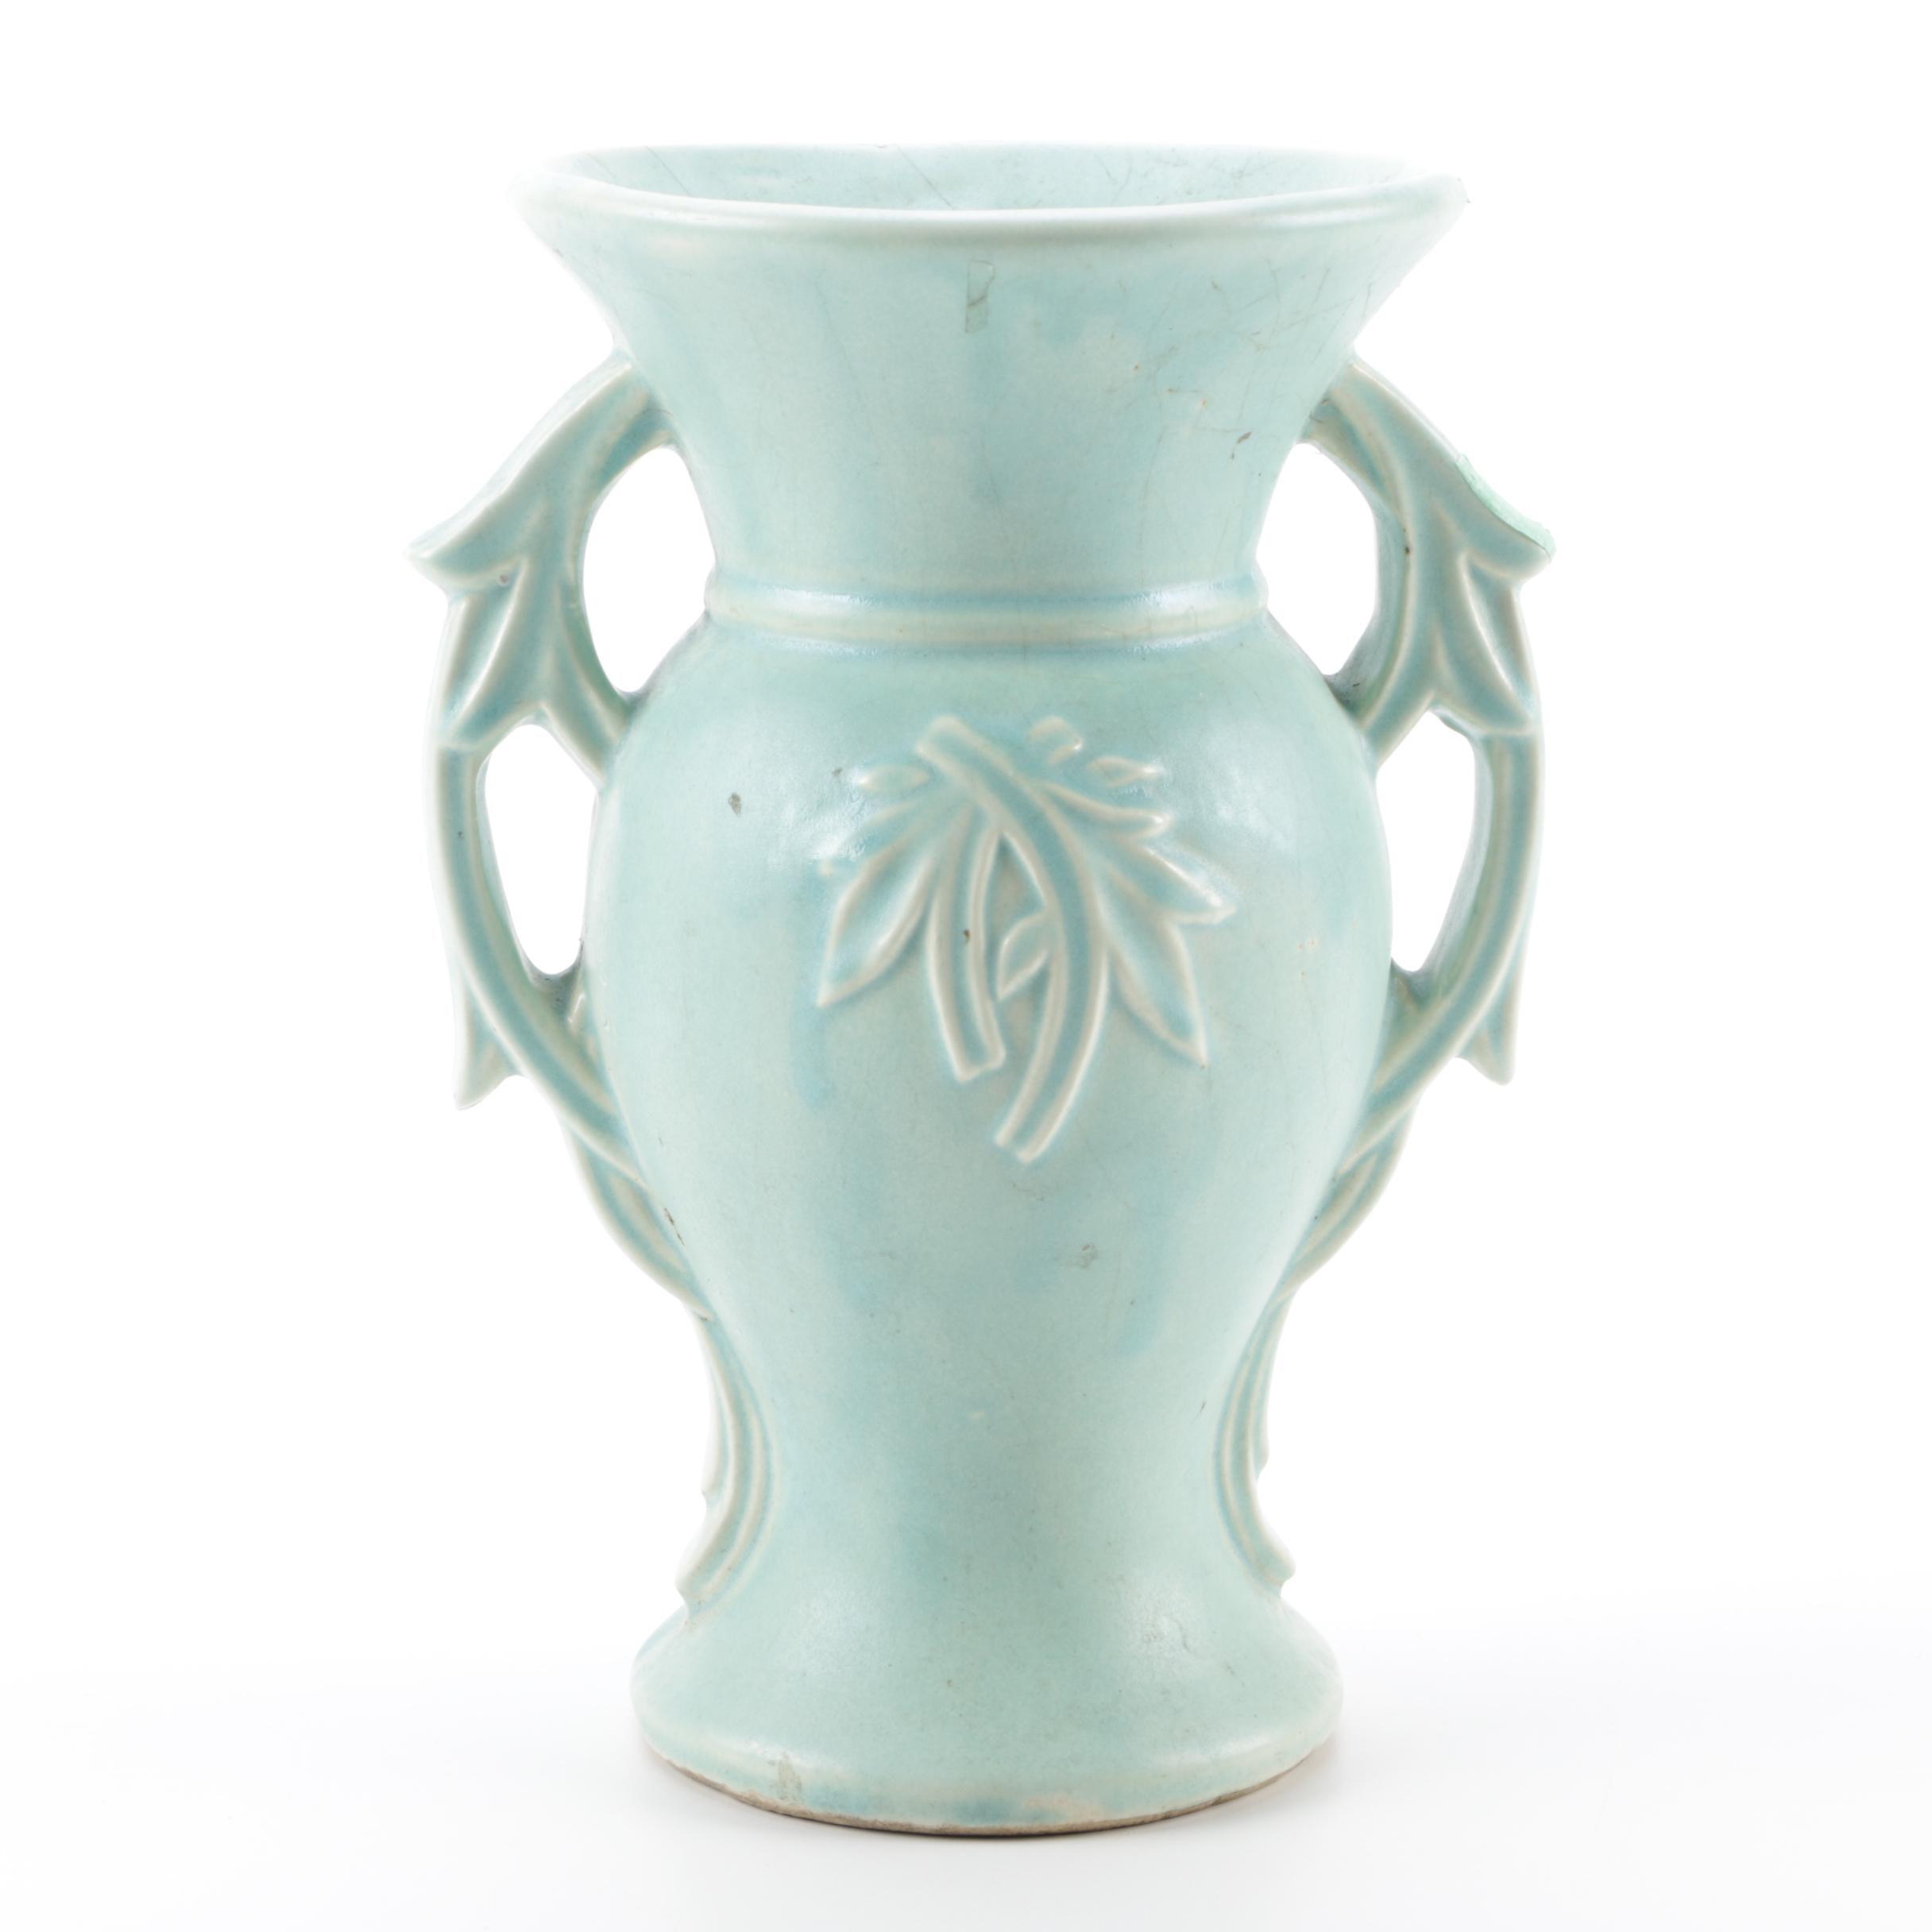 Vintage McCoy Double Handled Vase